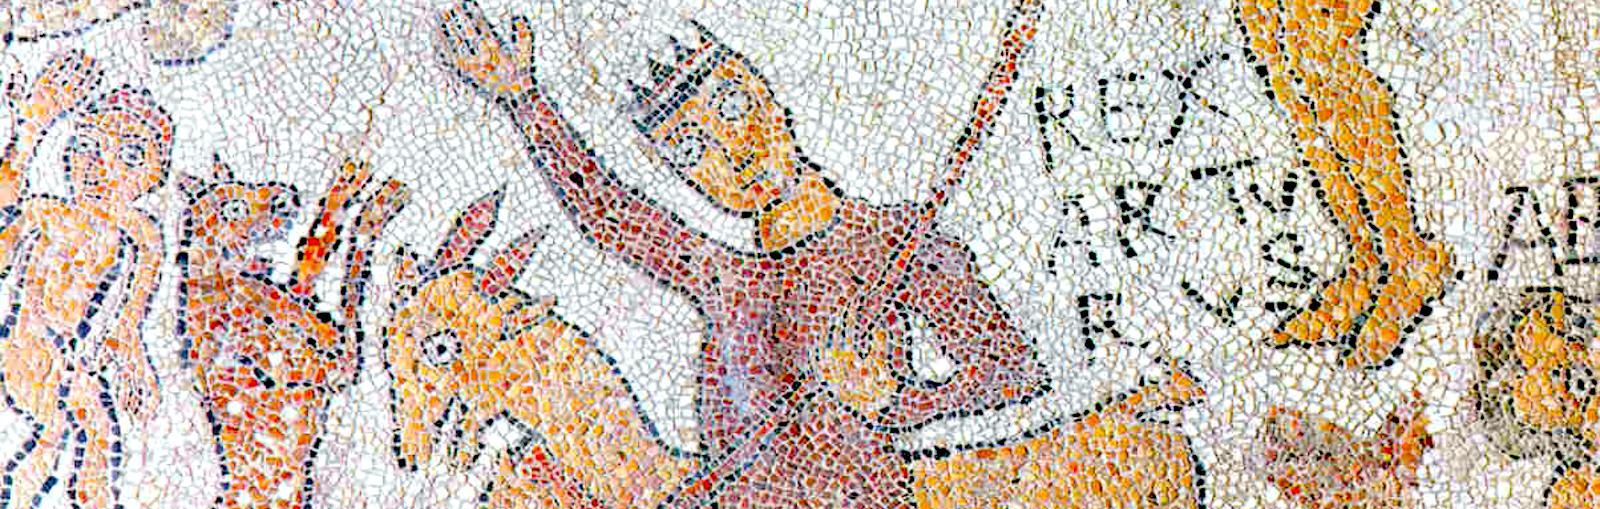 otranto mosaico